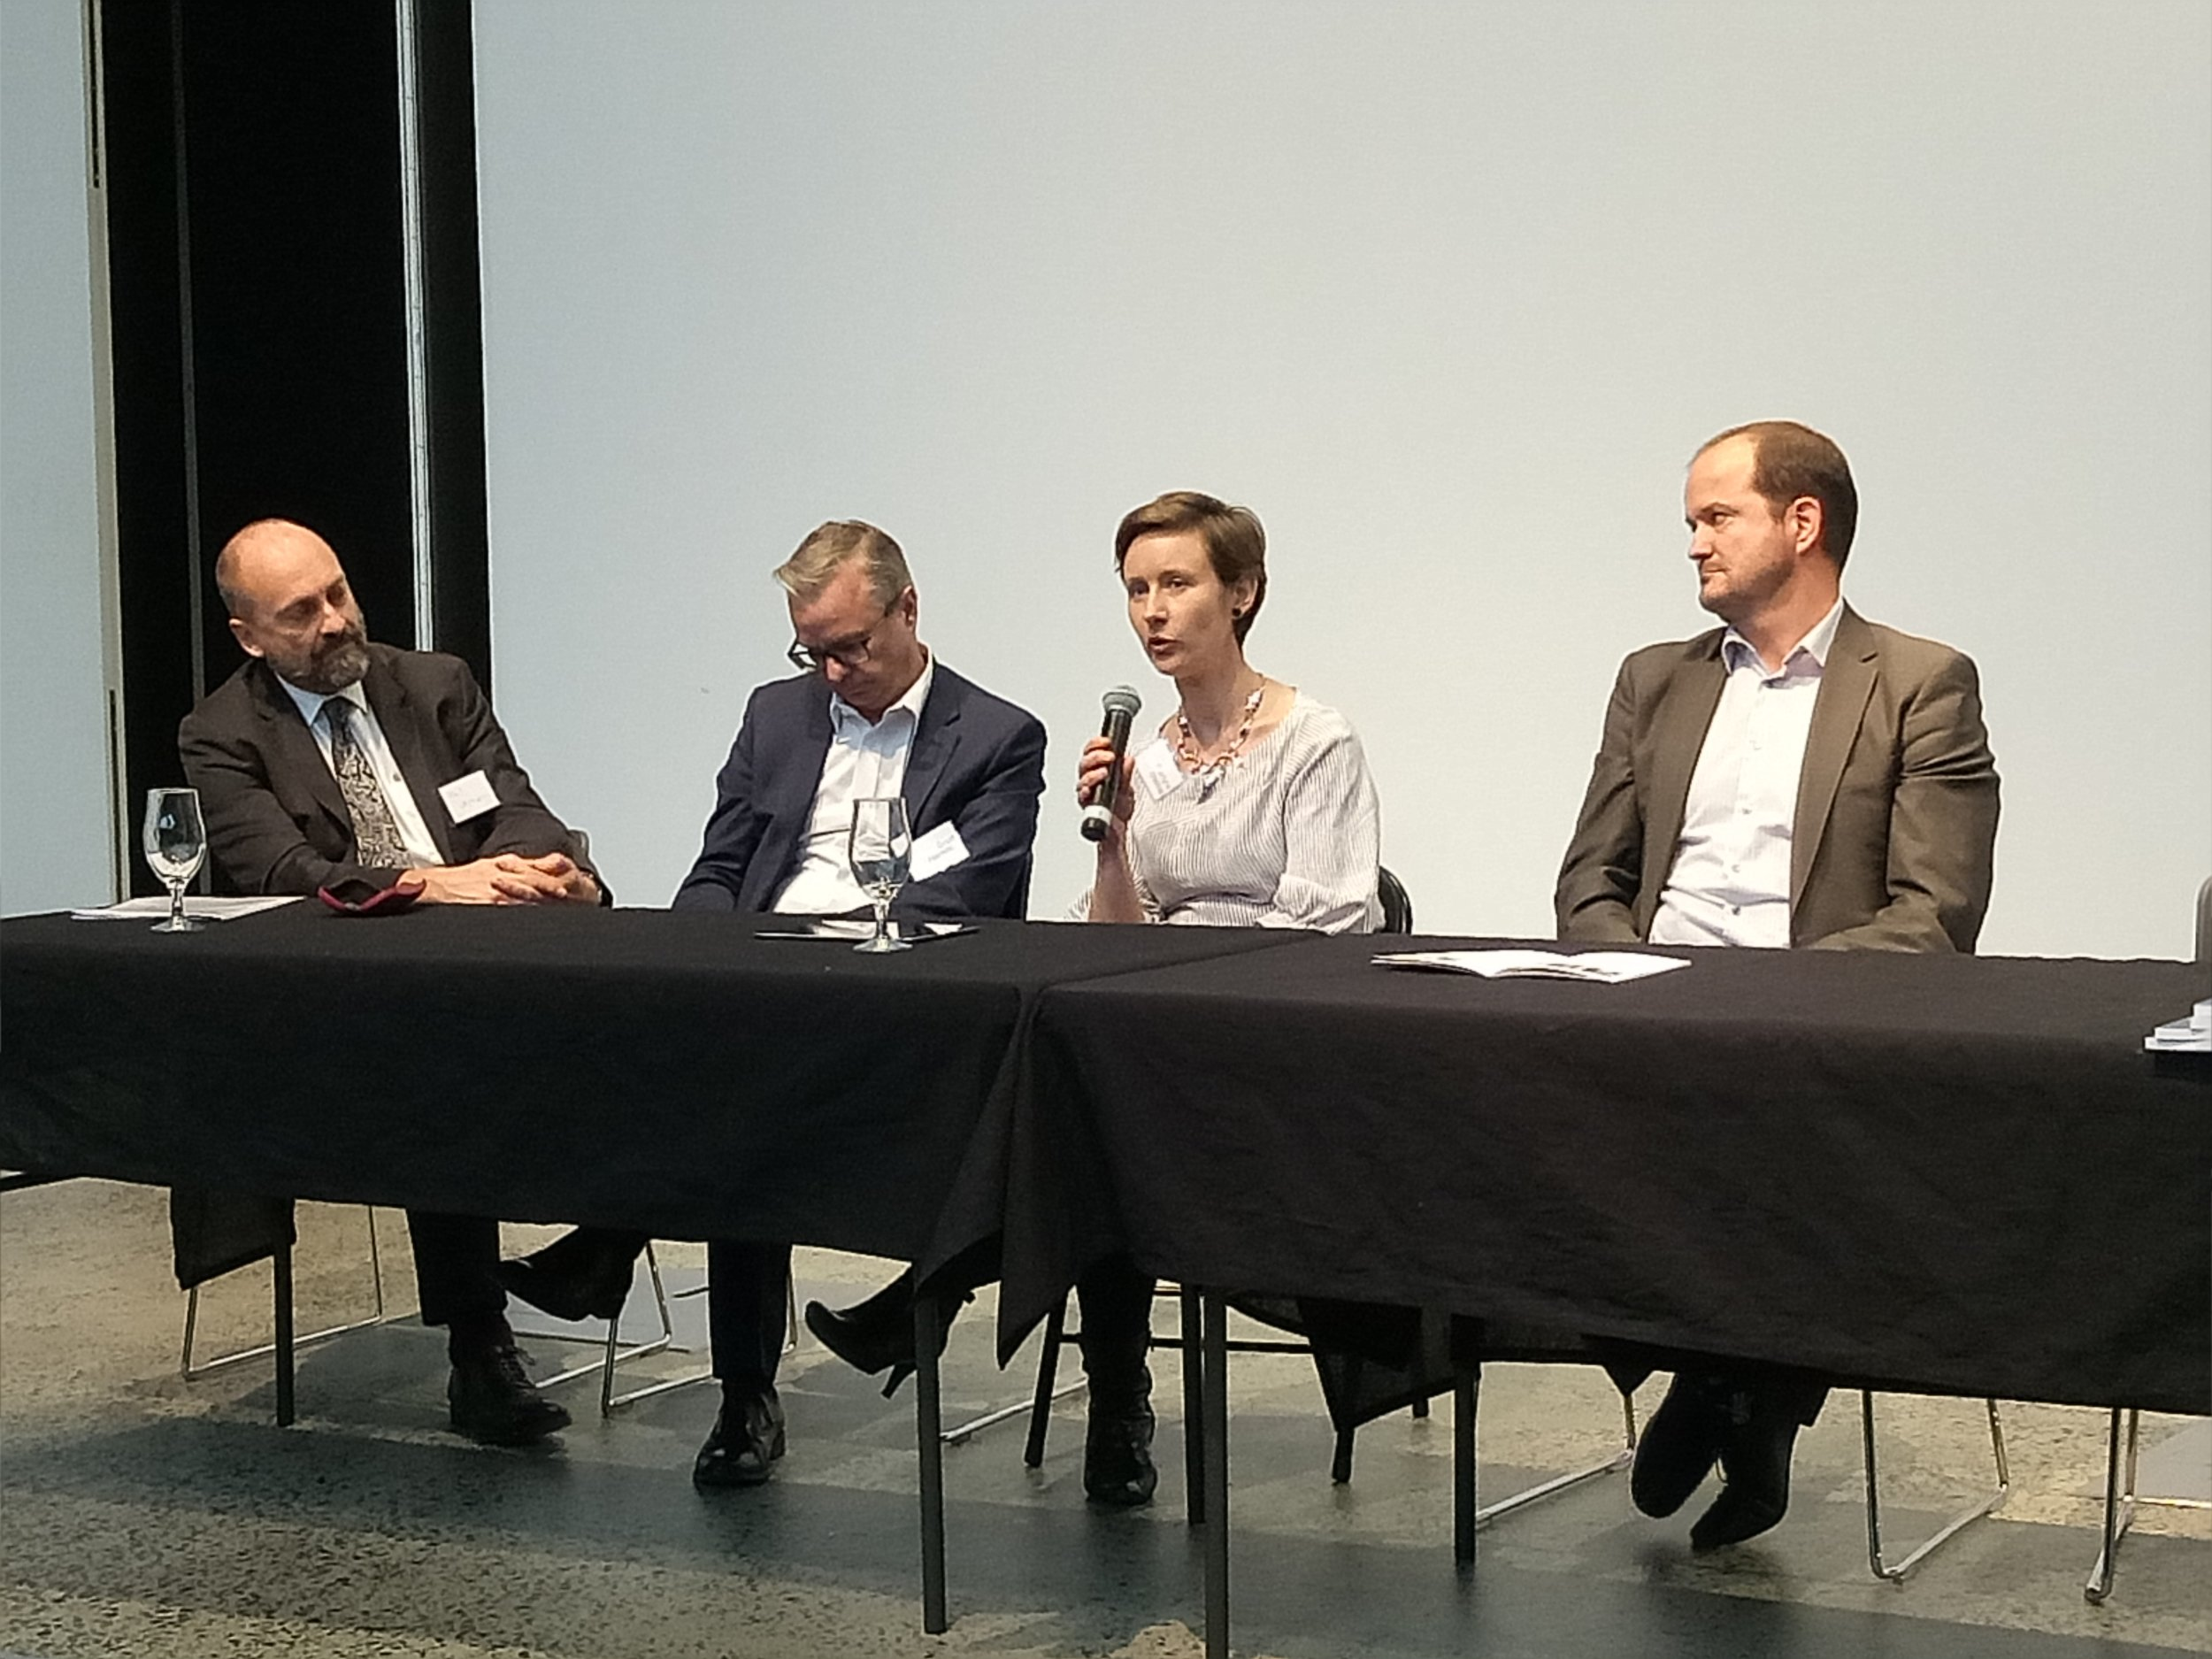 Panel discussion 'Investment and Finance' - Phil Vernon, Scott Hamilton, Marilyne Crestias, Scott Bocskay.